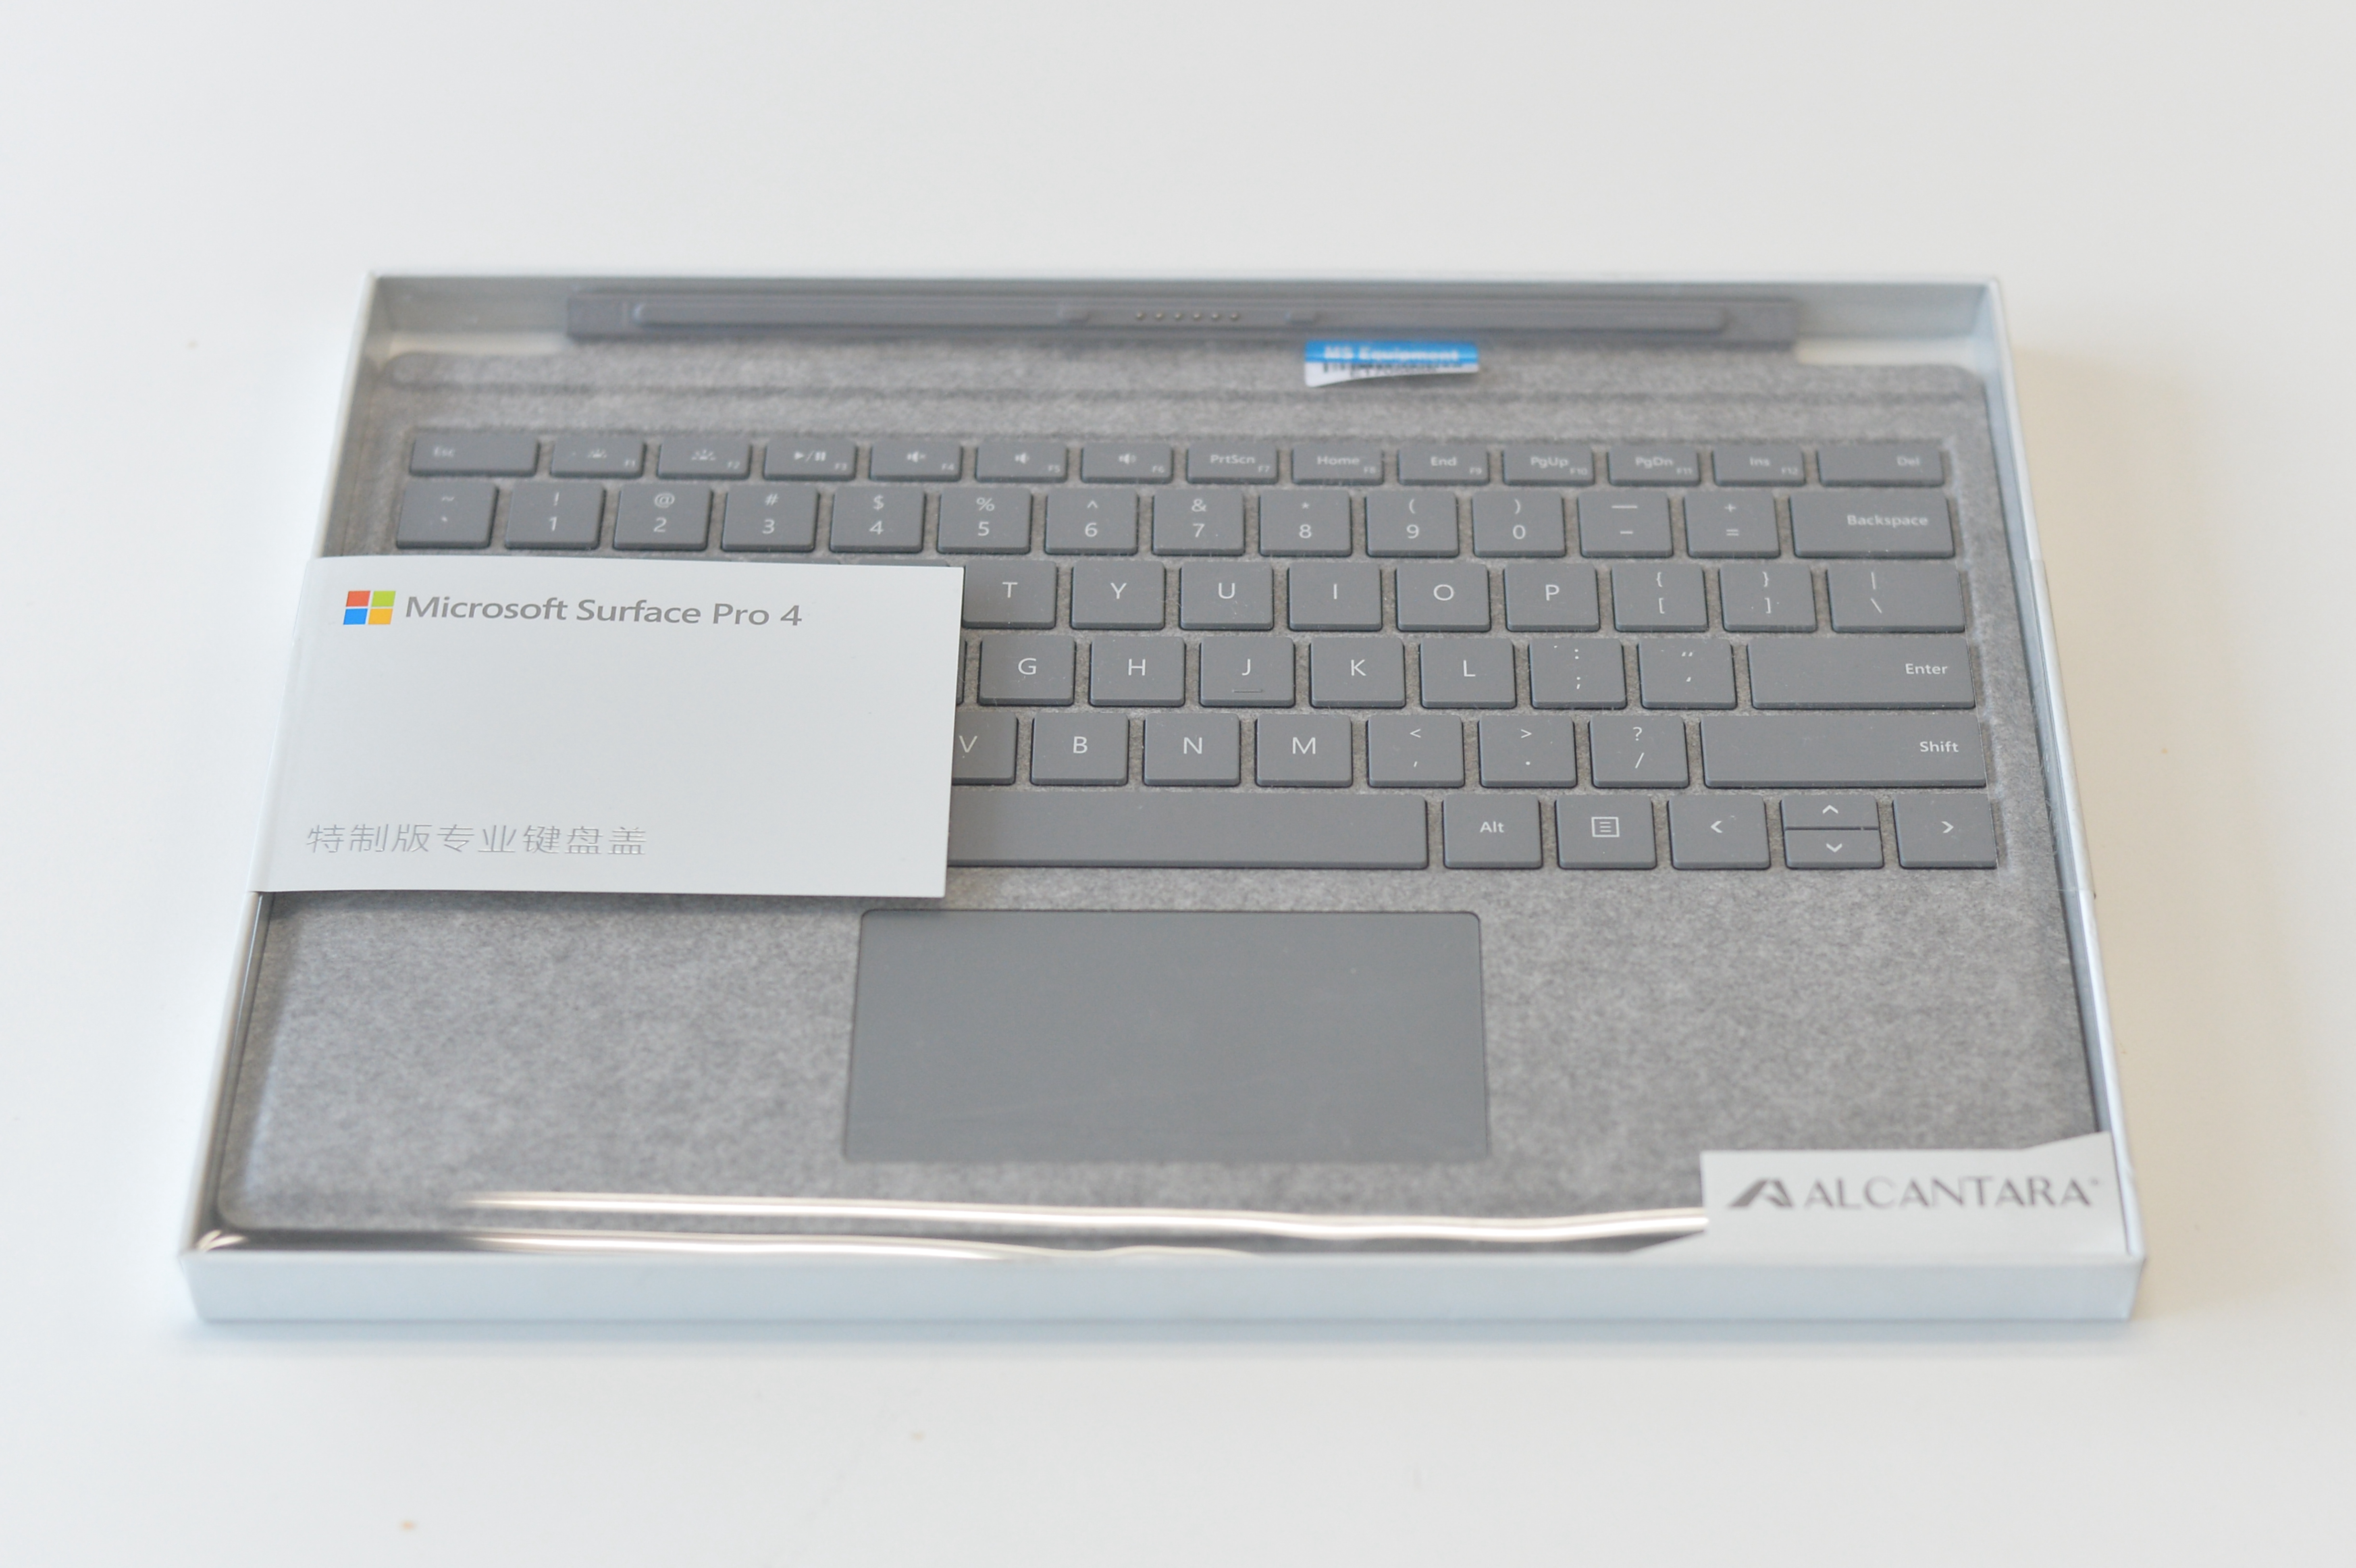 Surface Pro 4 Alcantara特制版键盘上线的照片 - 1